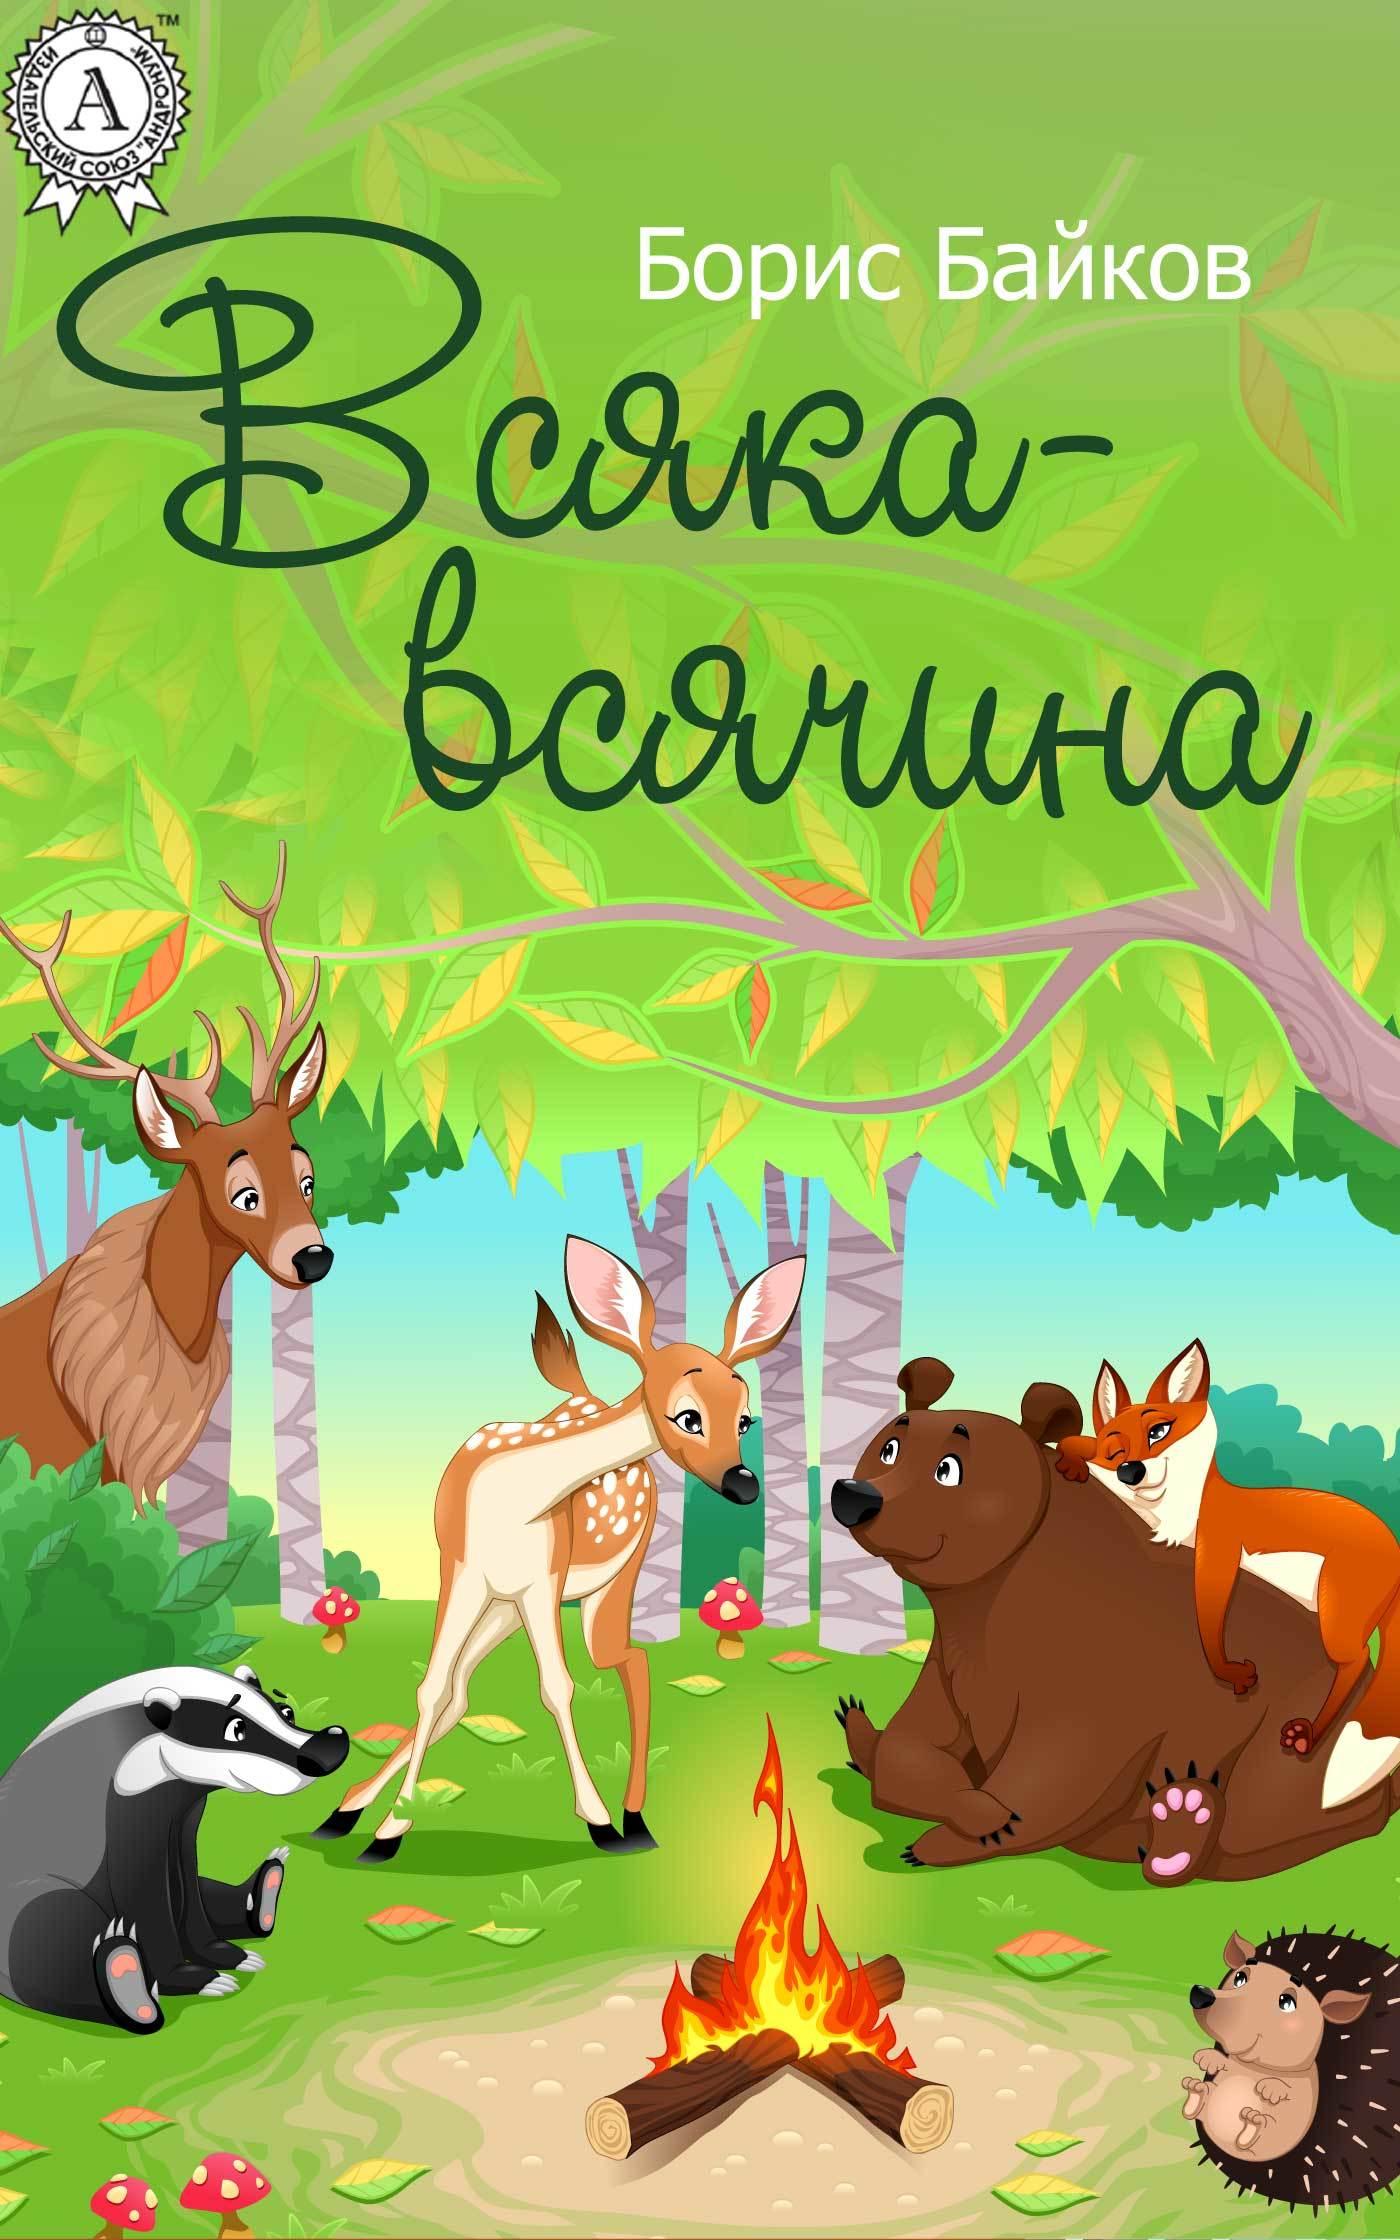 Борис Байков бесплатно